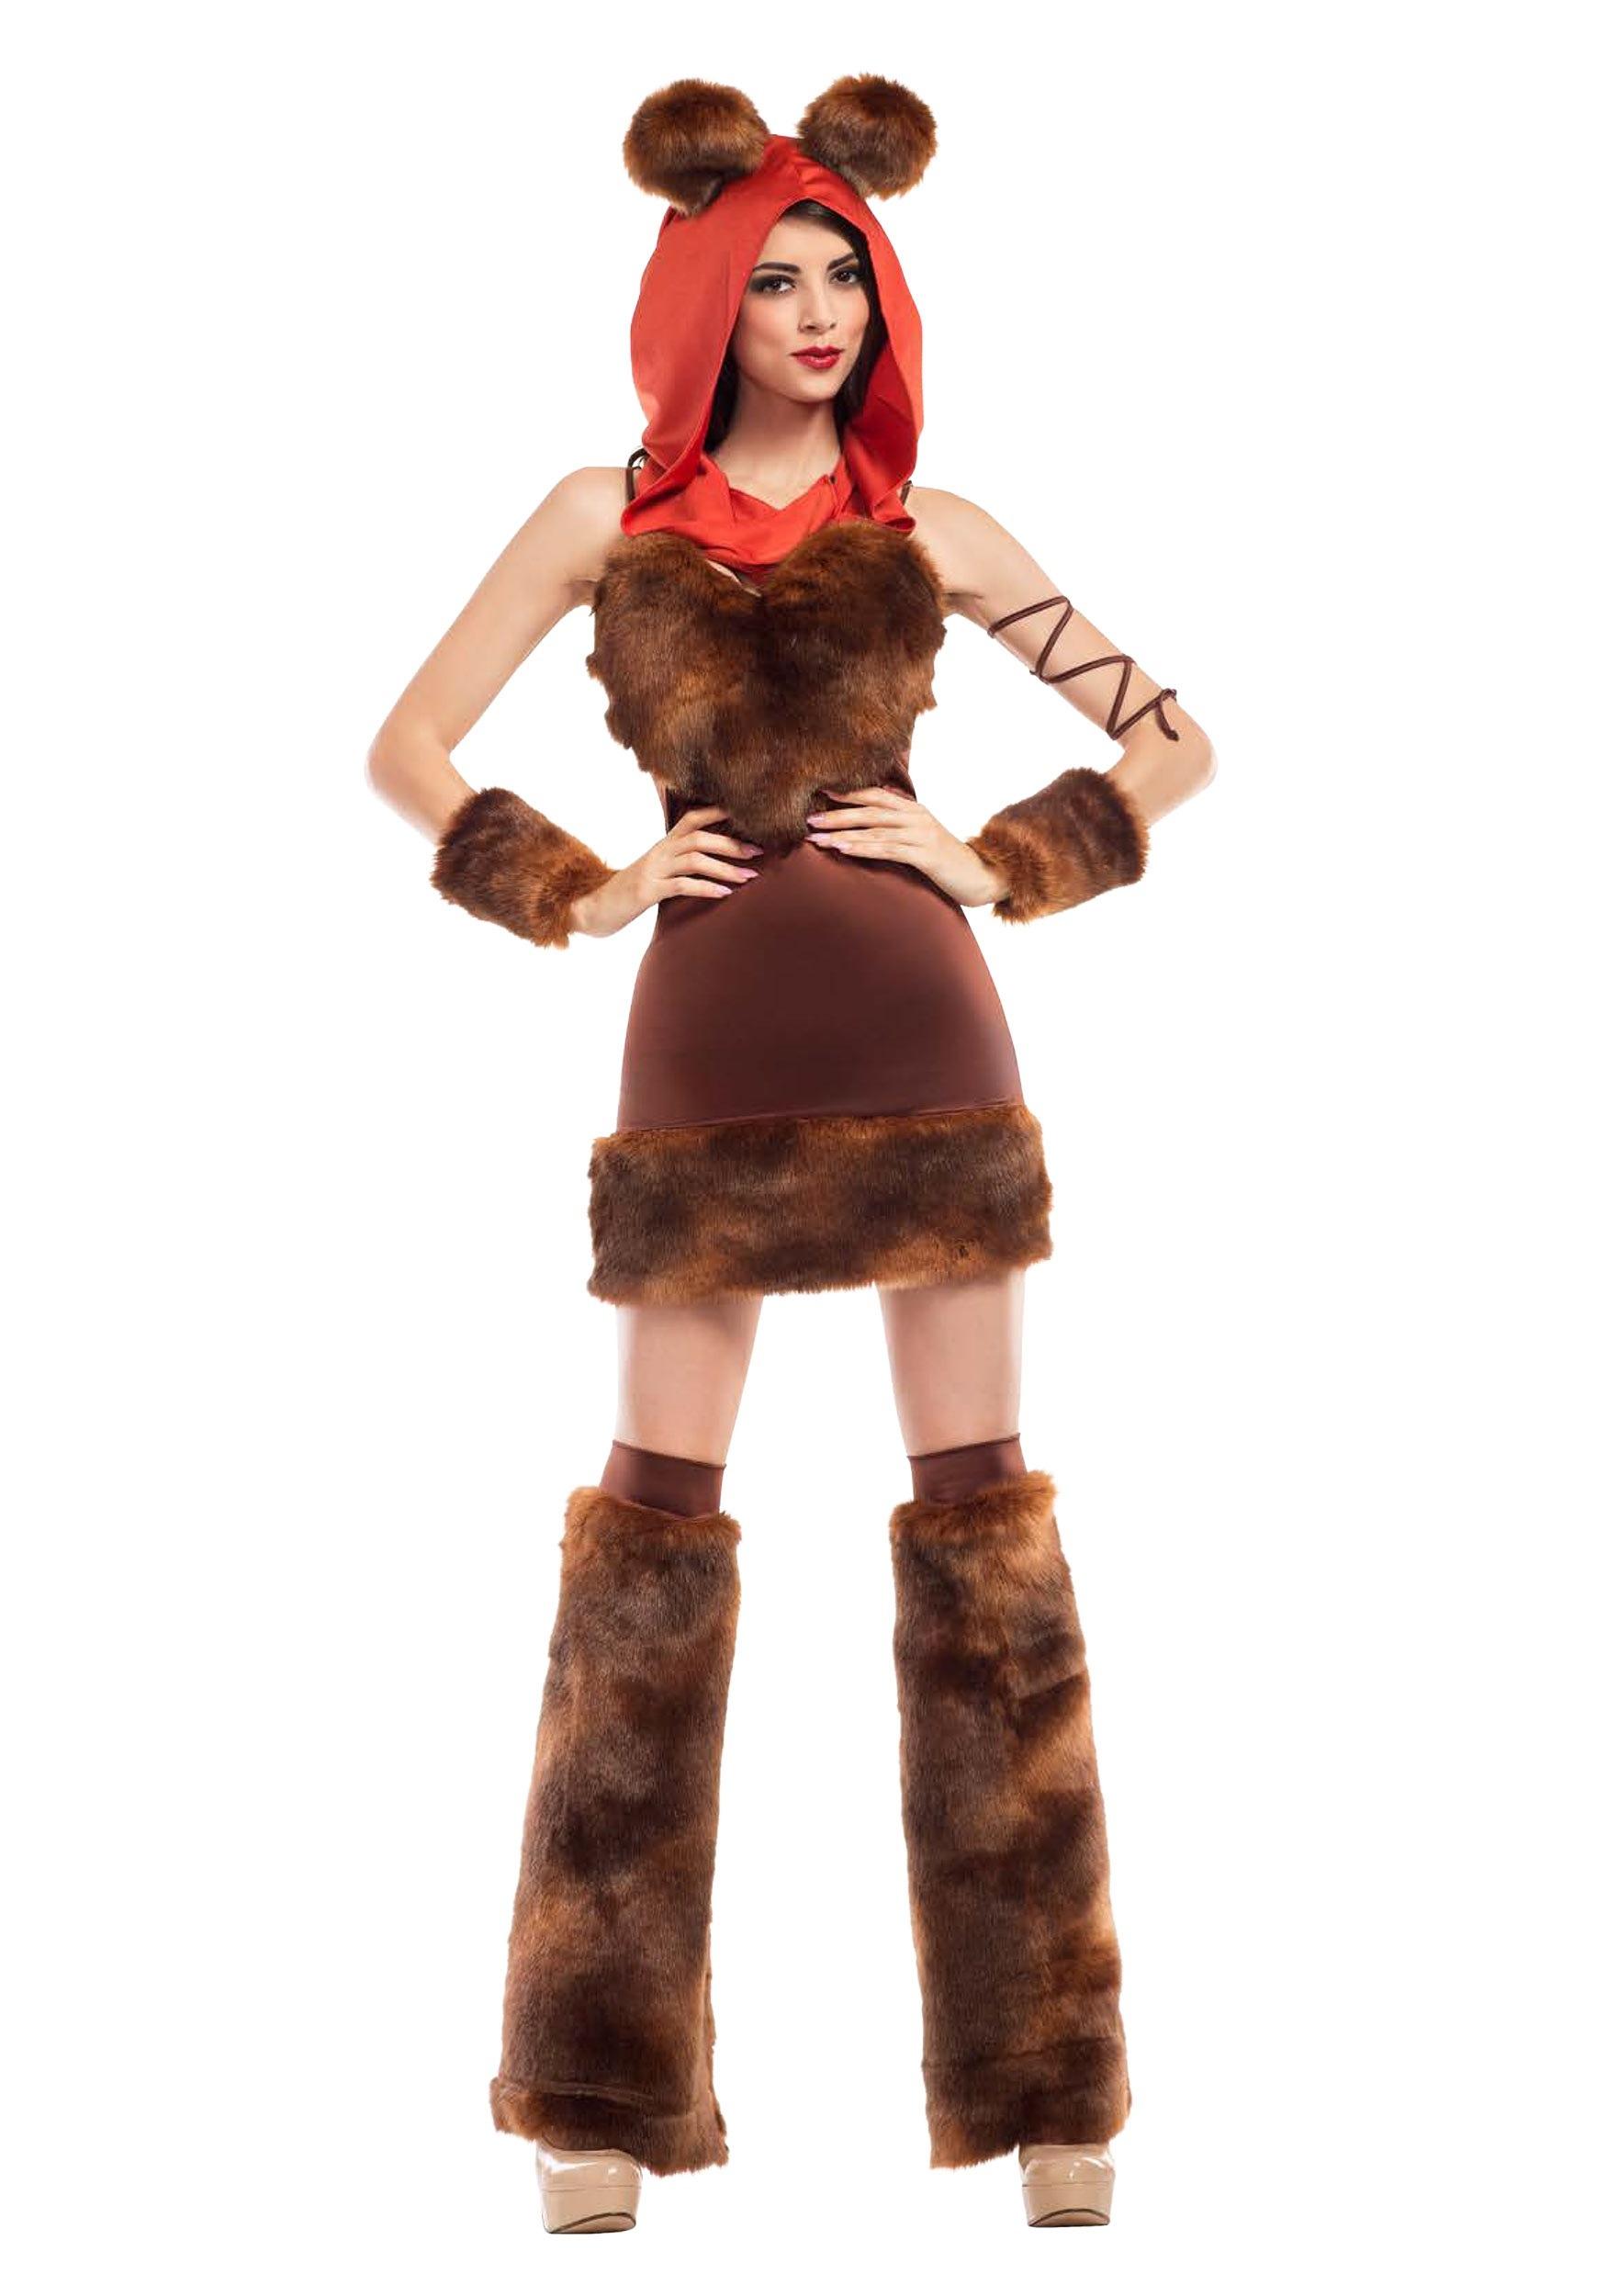 costume cute furry ewok space creature costumes womens adults halloweencostumes wars star dress